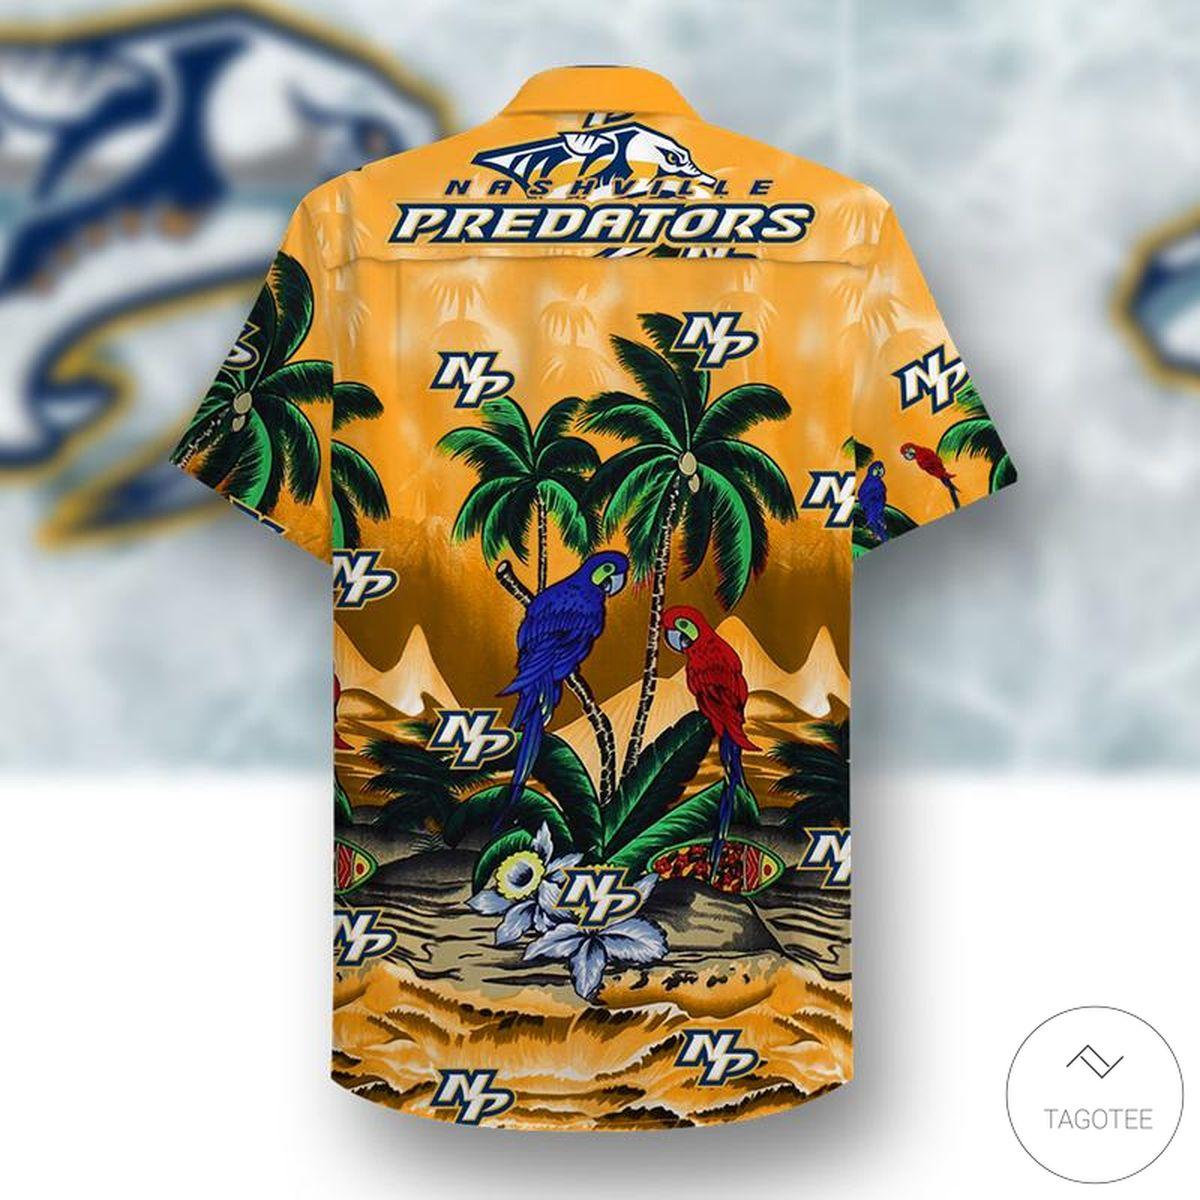 Nashville Predators Hawaiian Shirt x